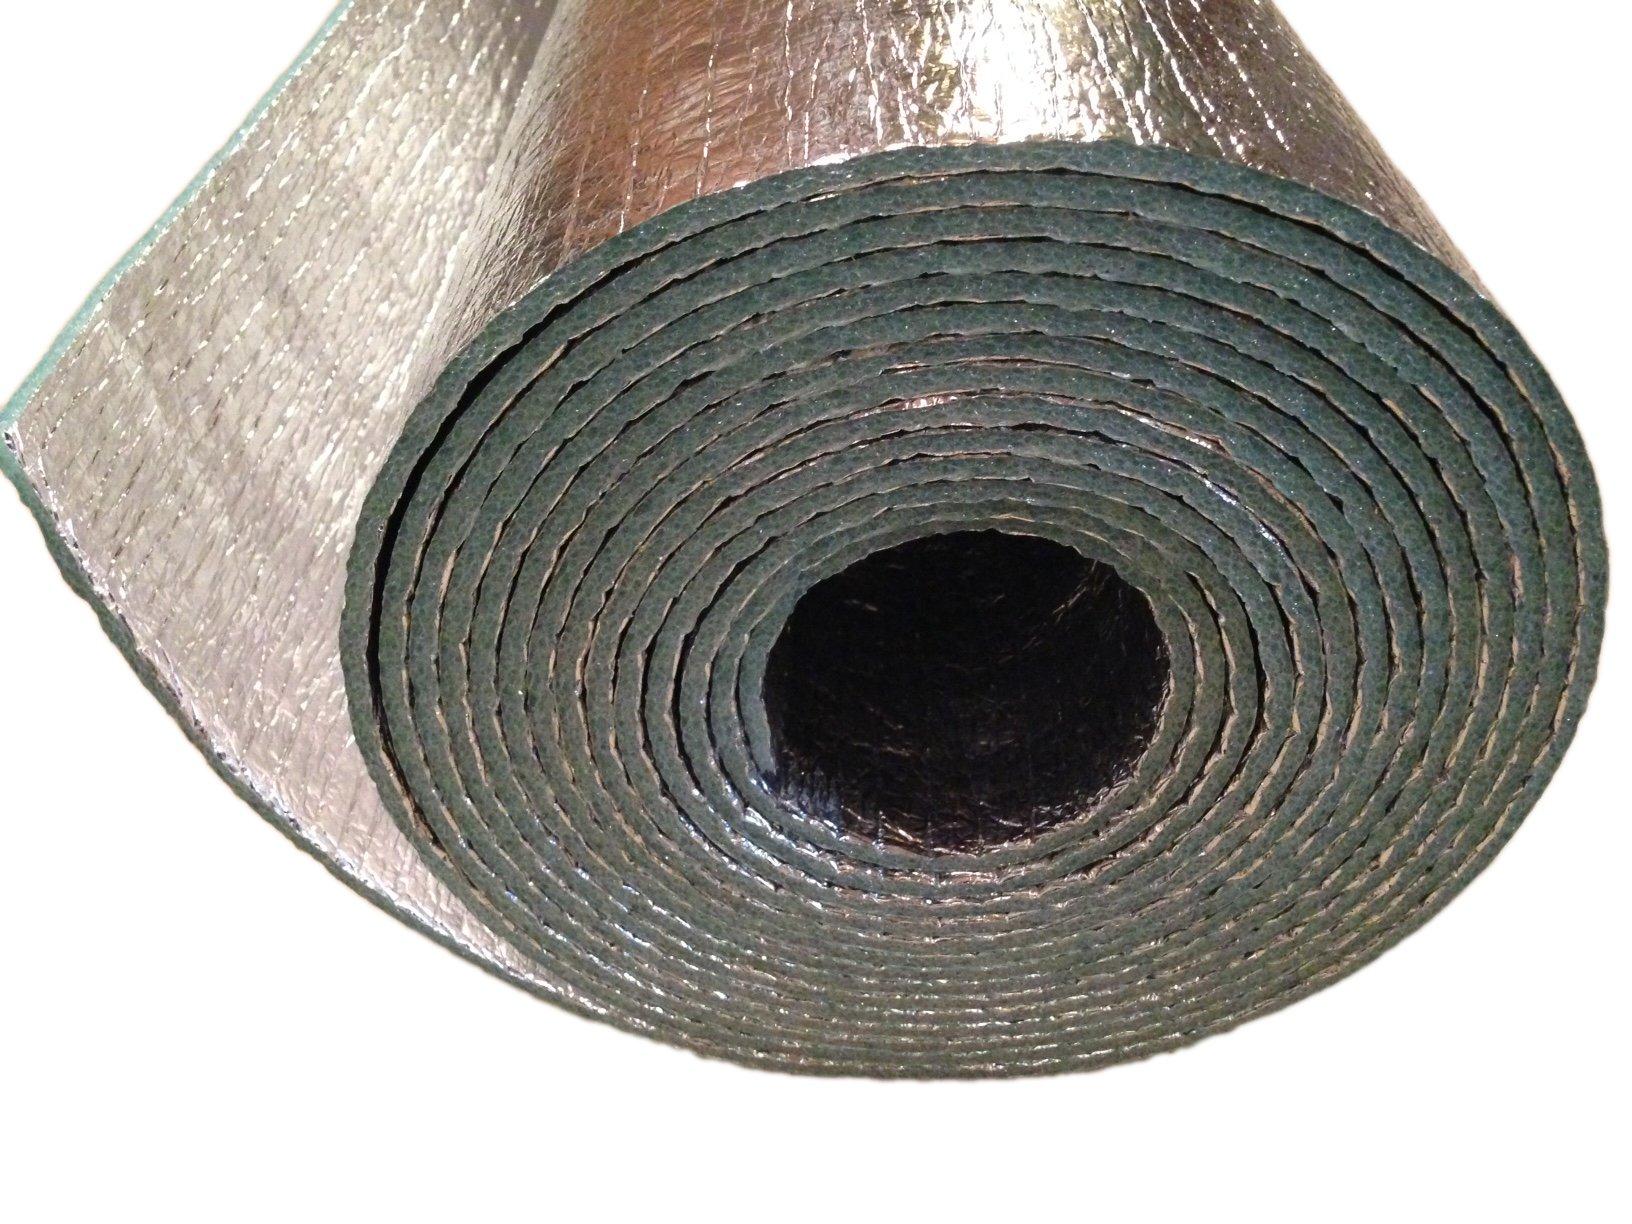 Car Insulation - 4' x 10' Roll (40 Sqft) Sound Deadener & Heat Barrier Mat - Automotive Lightweight Thermal Insulation by Carinsulation.com